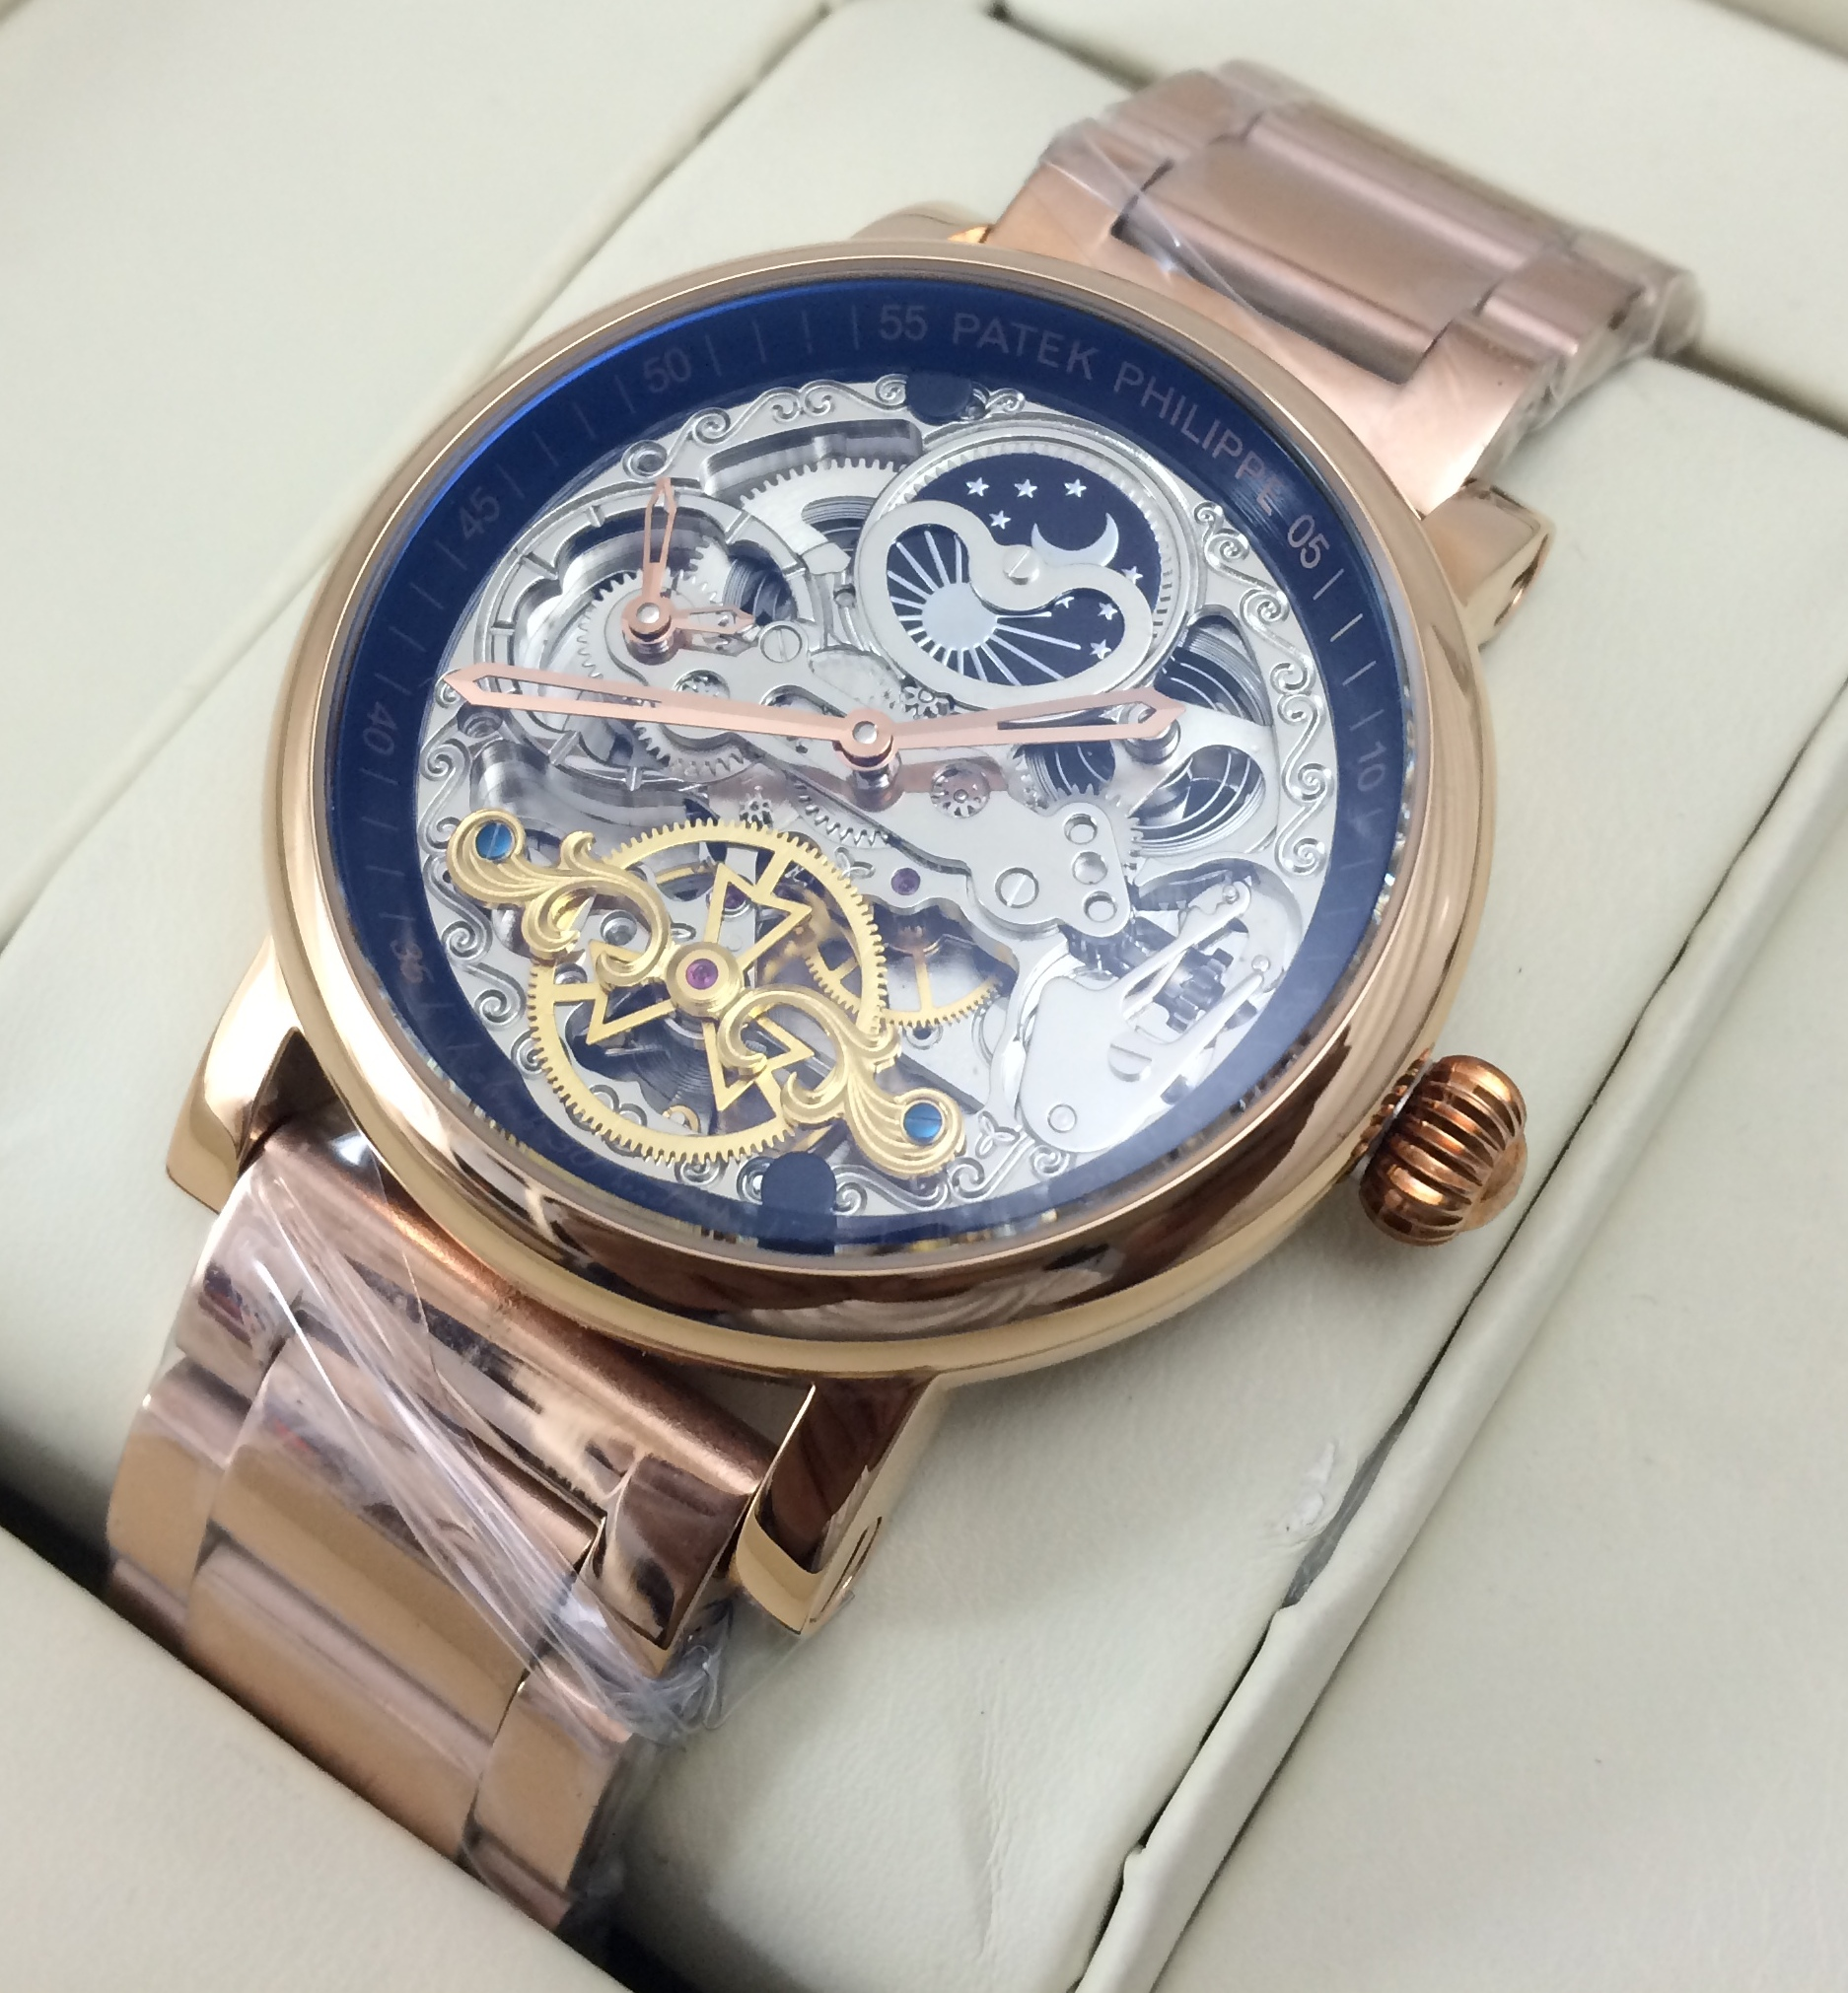 Patek Philippe Geneve Moonphase Skeleton Swiss Watch Best Deals With Price Comparison Online